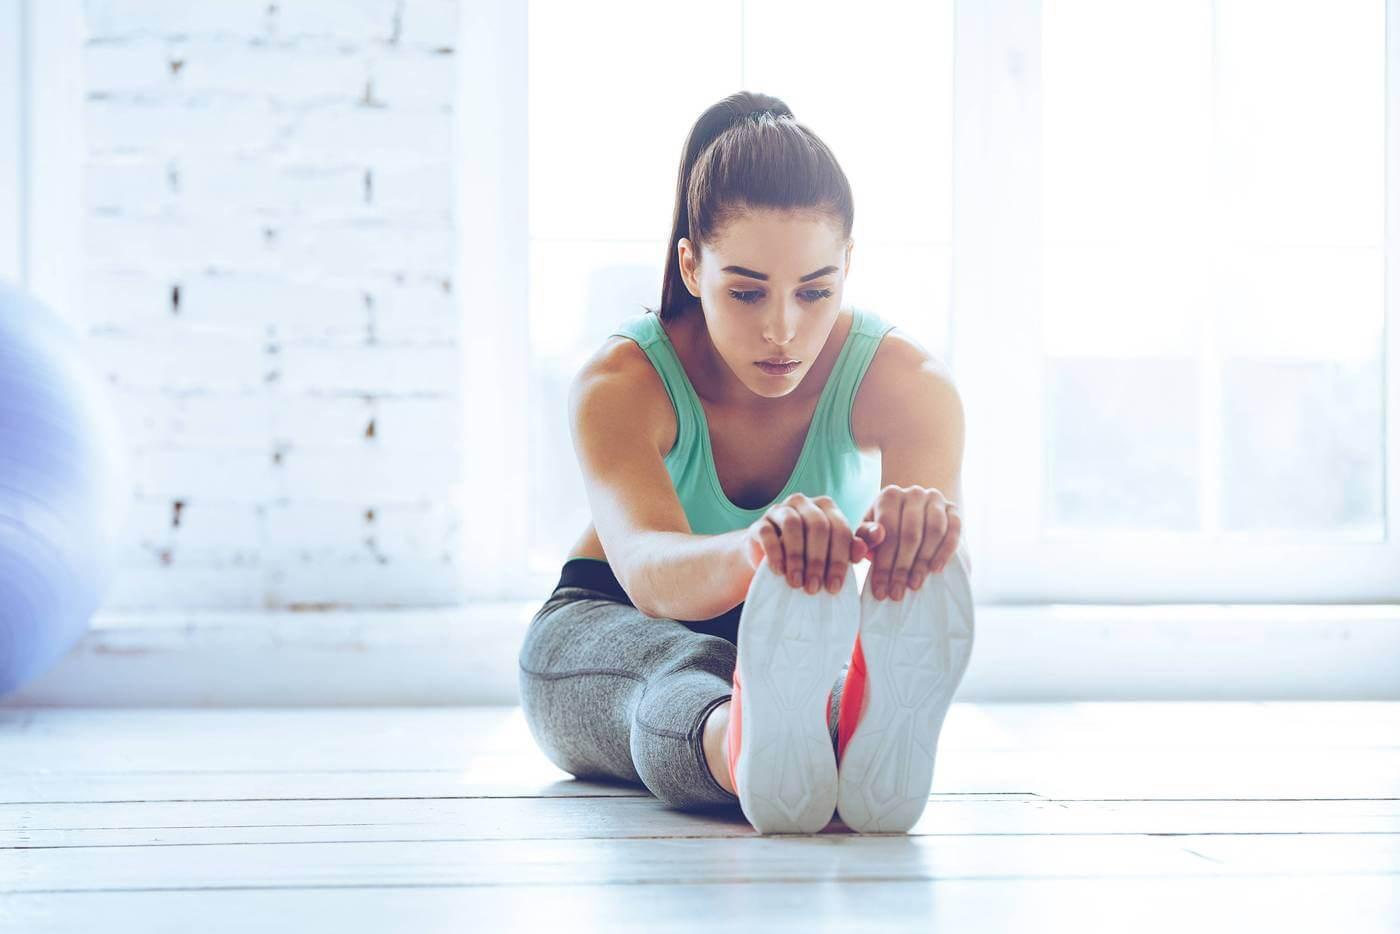 alongamento para ginástica exercício para pernas